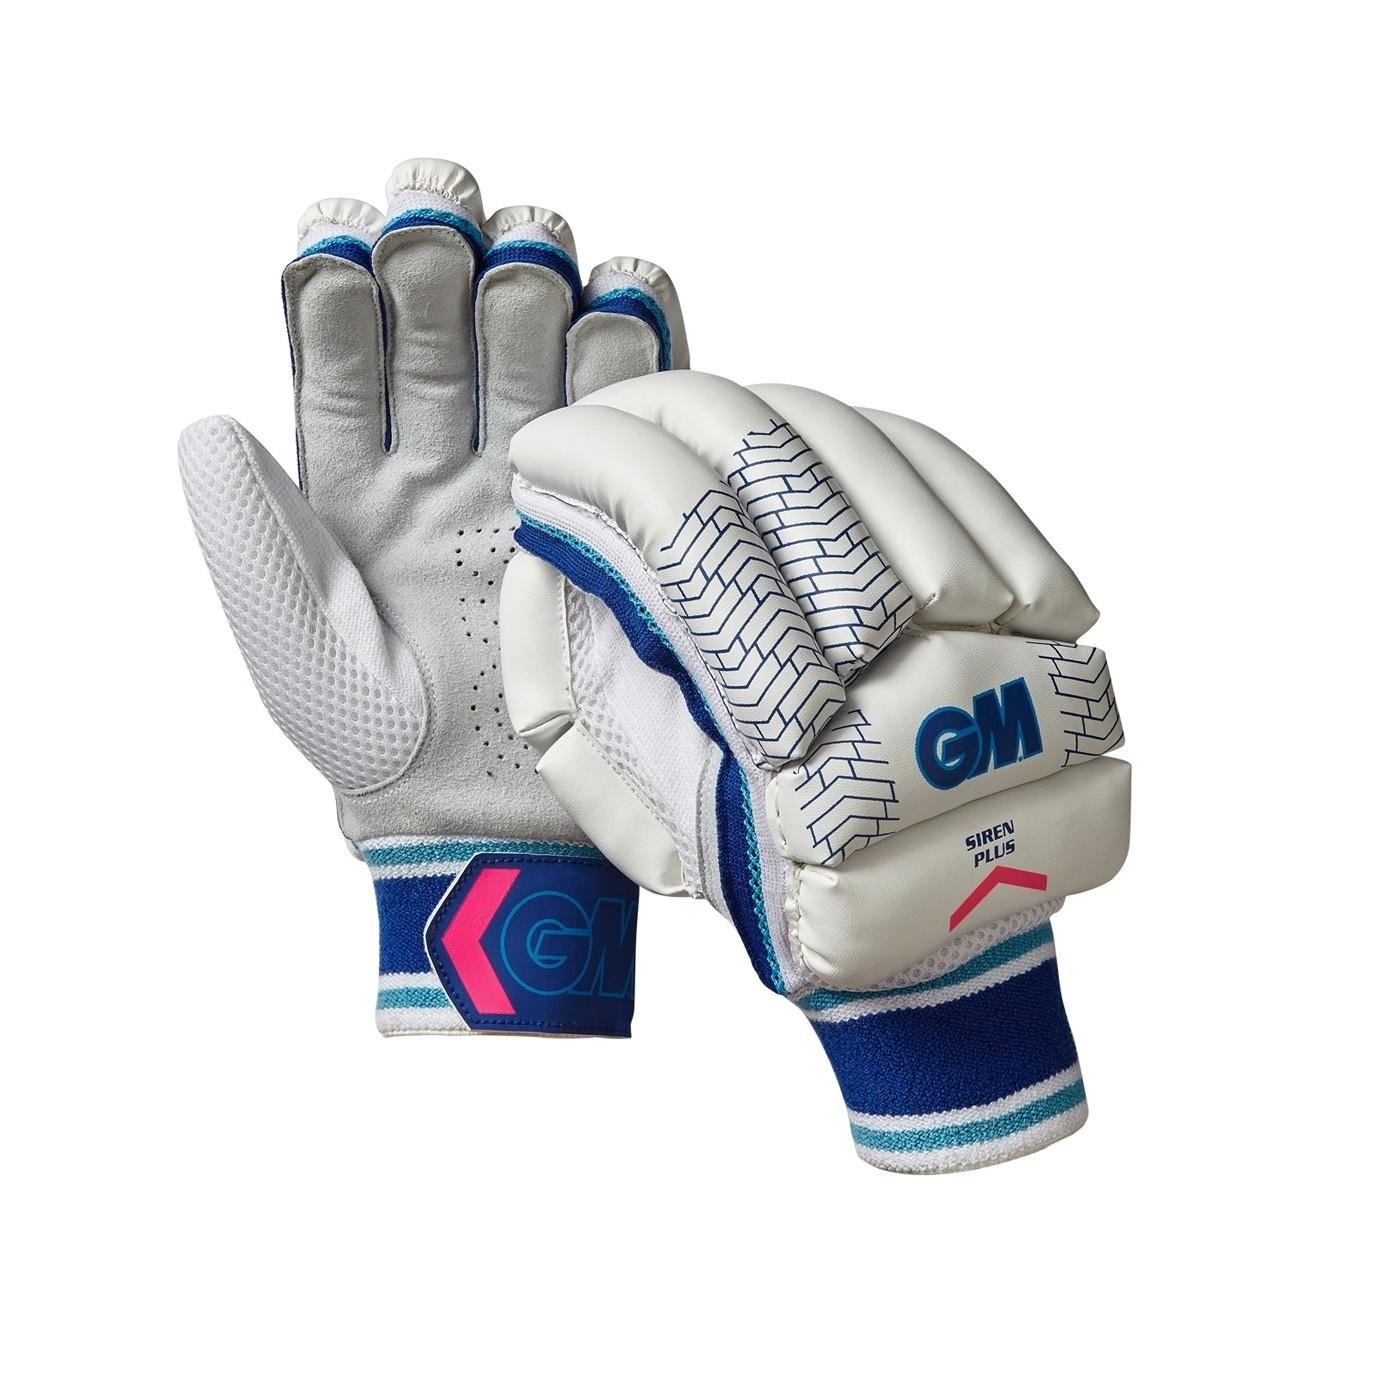 2021 Gunn and Moore Siren Plus Junior Batting Gloves